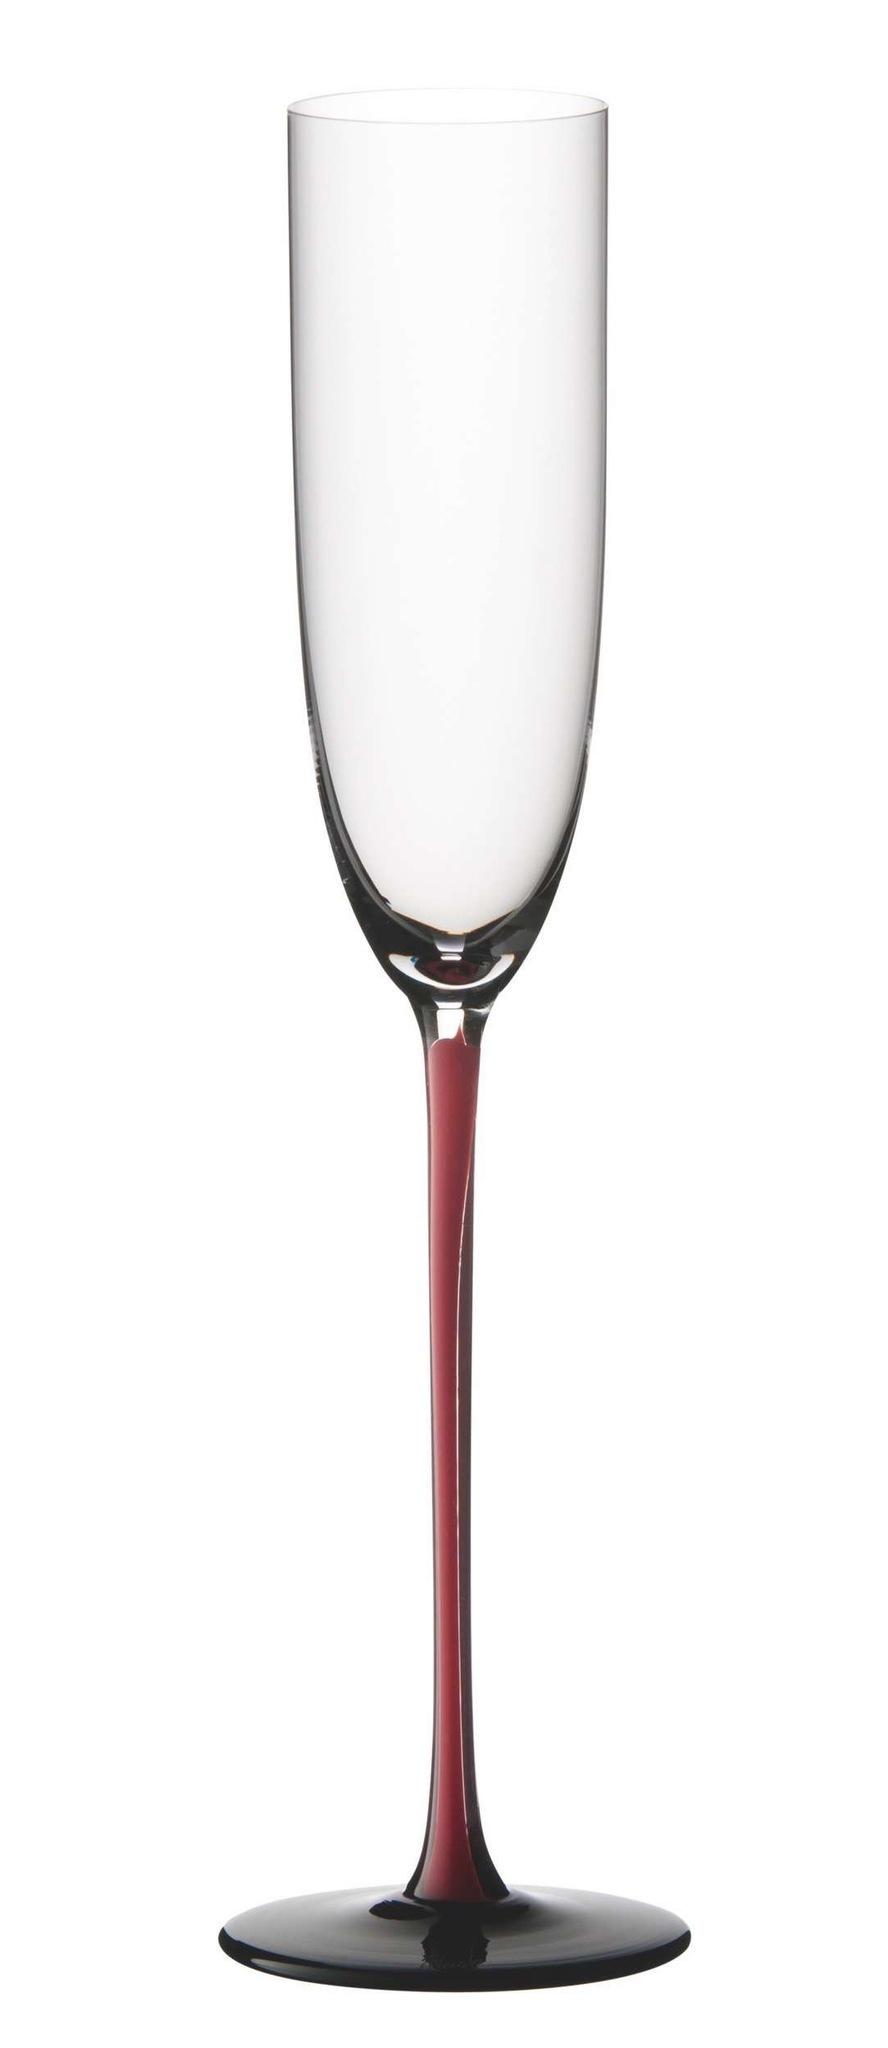 Бокал для шампанского Riedel Champagne, Sommeliers Black Series Collector'S Edition, 170 мл